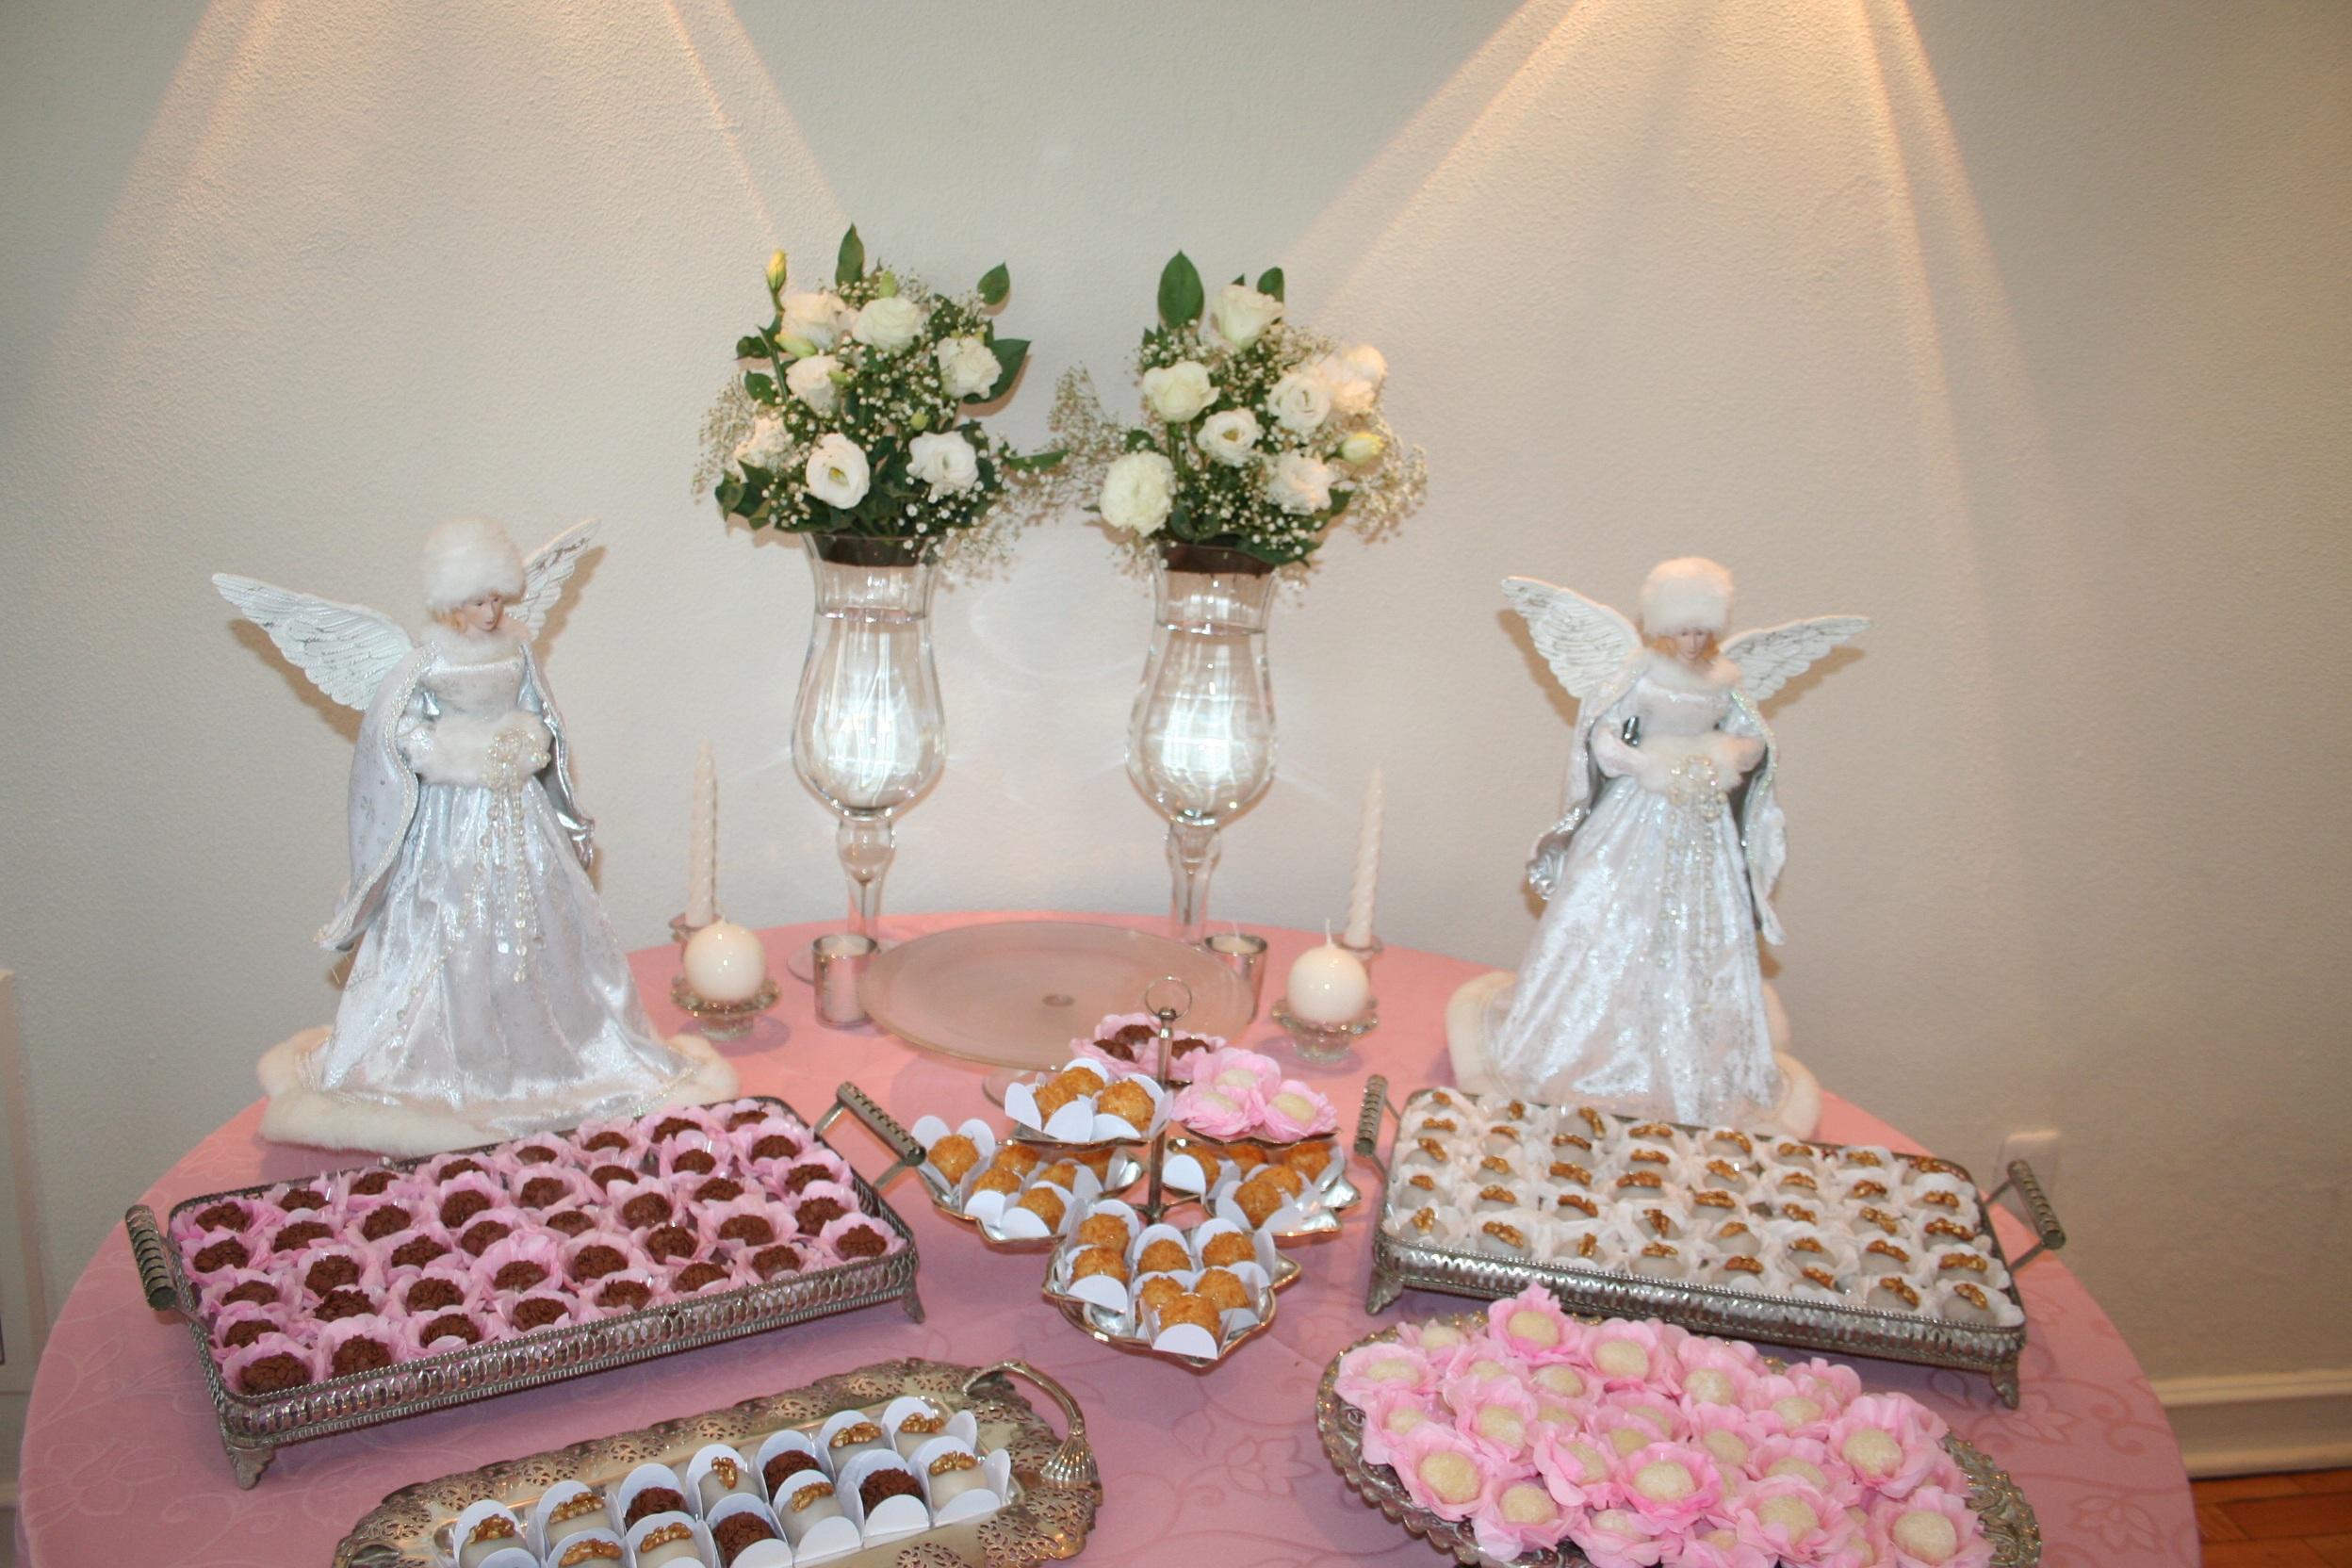 flor comida rosado ngeles pastel de boda mesa dulce decoracin de pasteles habitacin central chica de